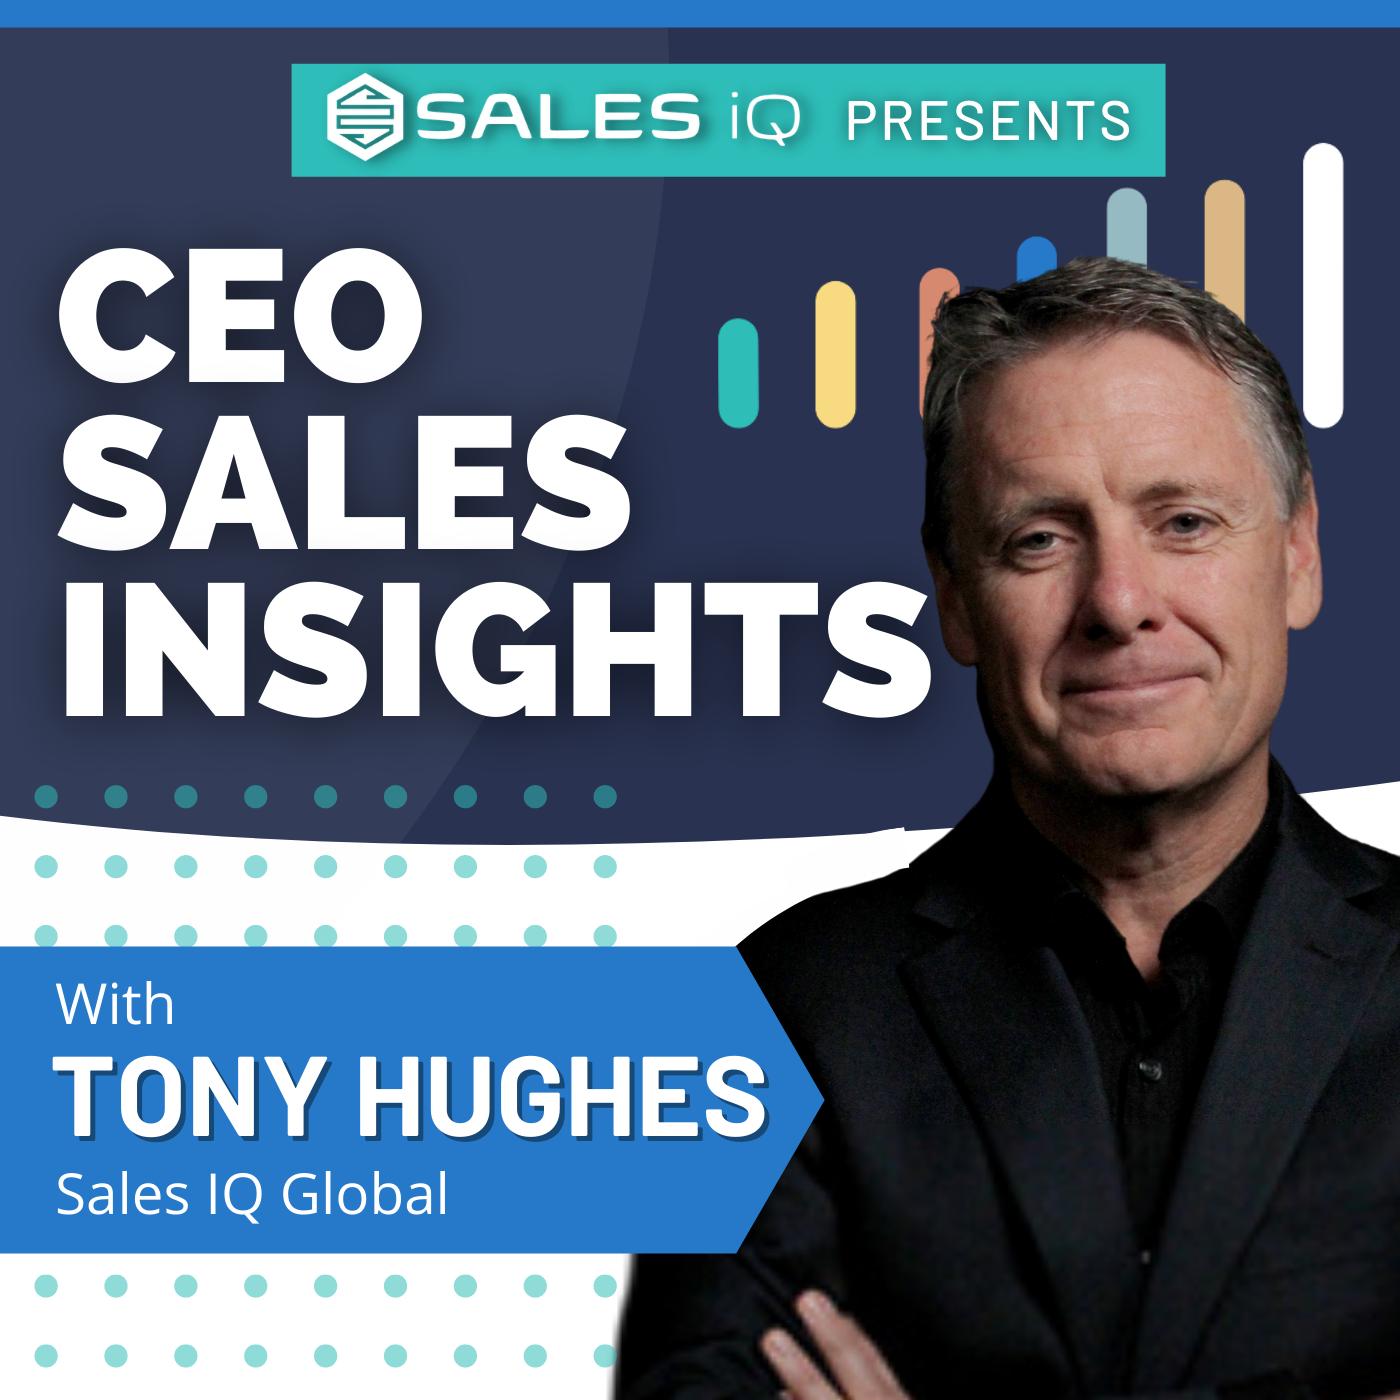 CEO Sales Insights